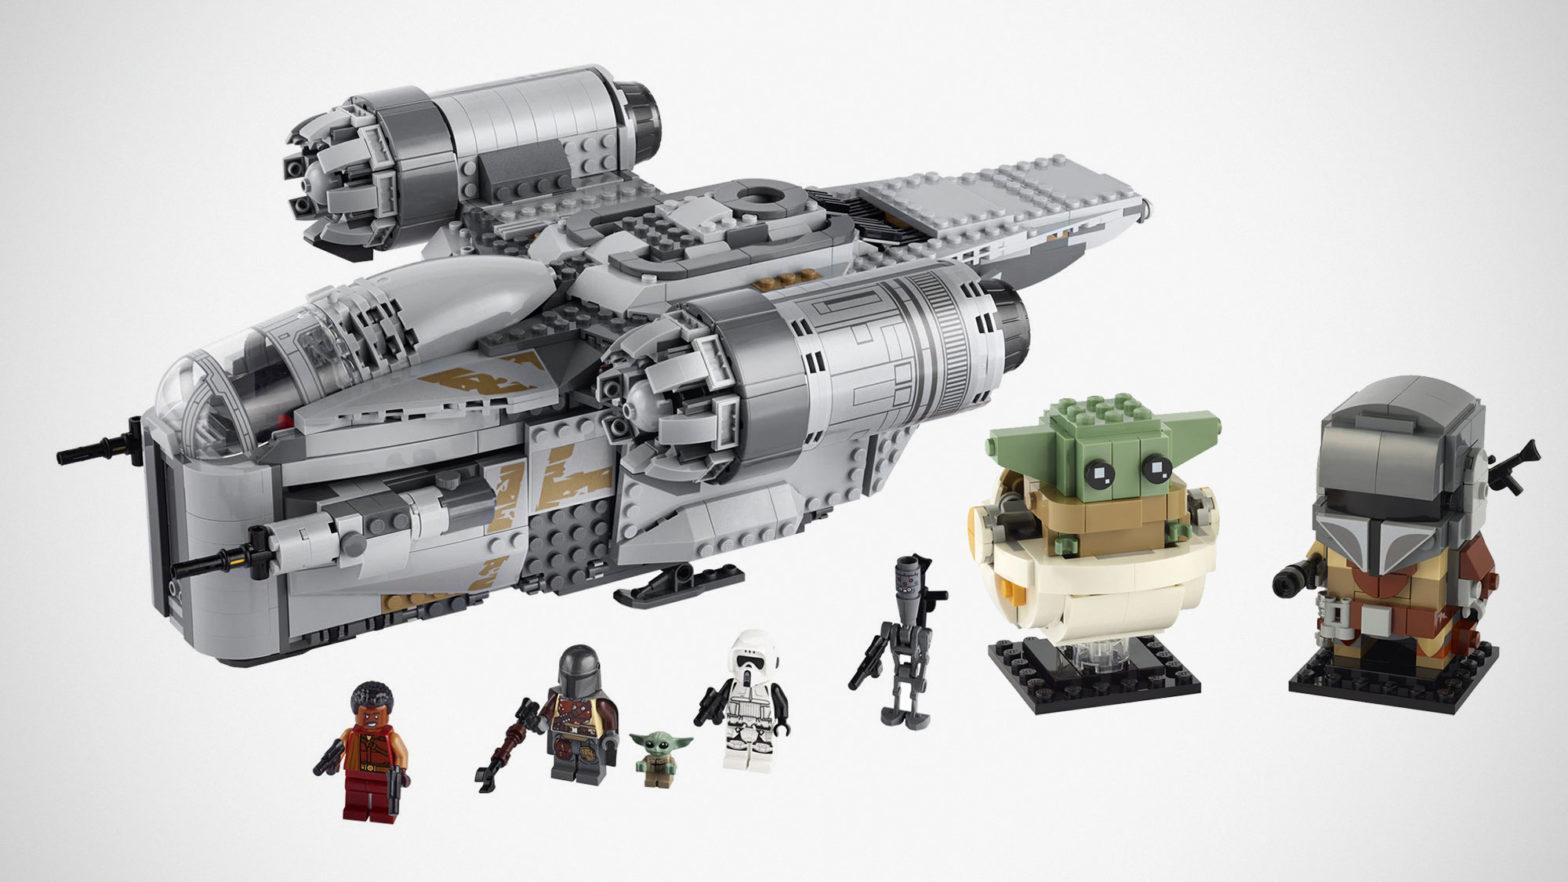 LEGO The Mandalorian BrickHeadz and The Razor Crest